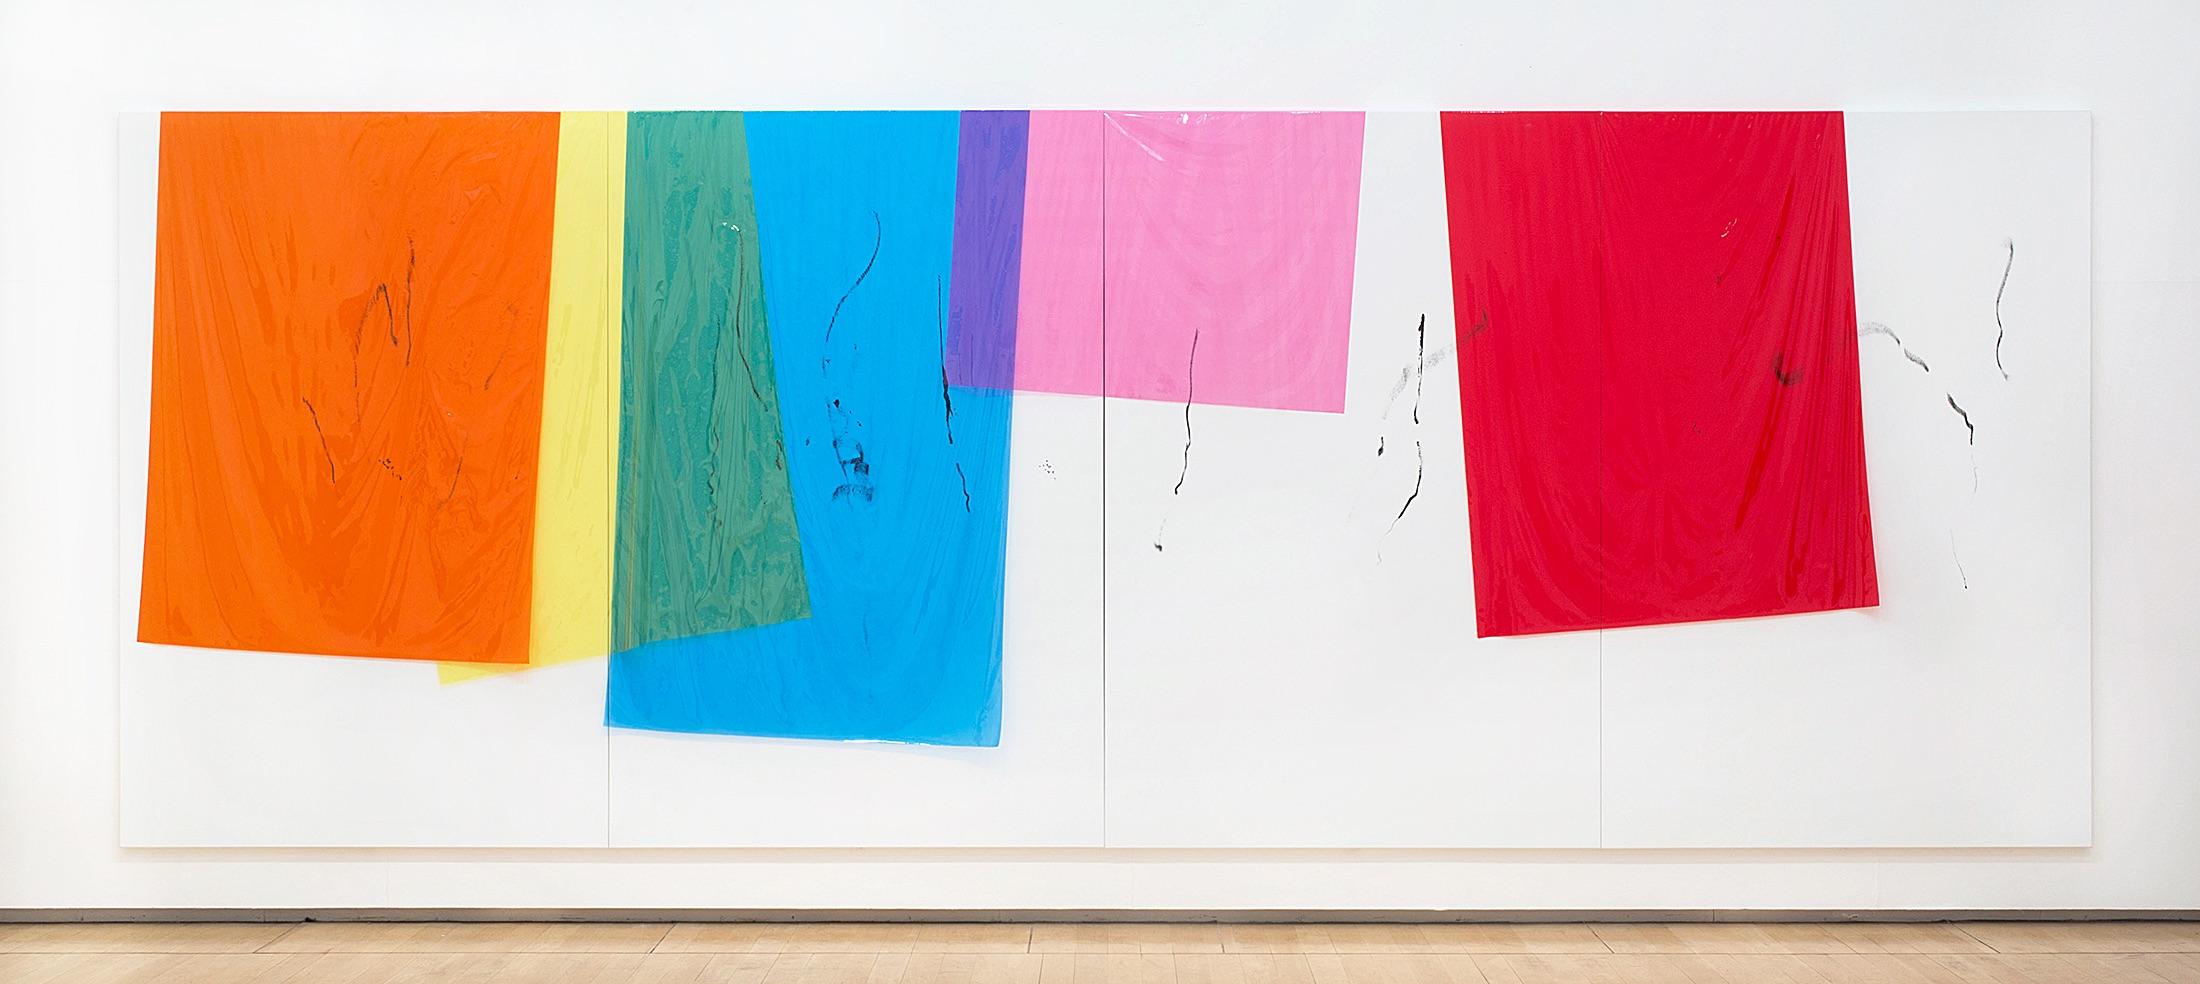 16090 | 2017 | Acryl, Lack, Sprühfarbe, PE Folie auf Leinwand | 240 x 640 cm | ©GALERIE ALBER